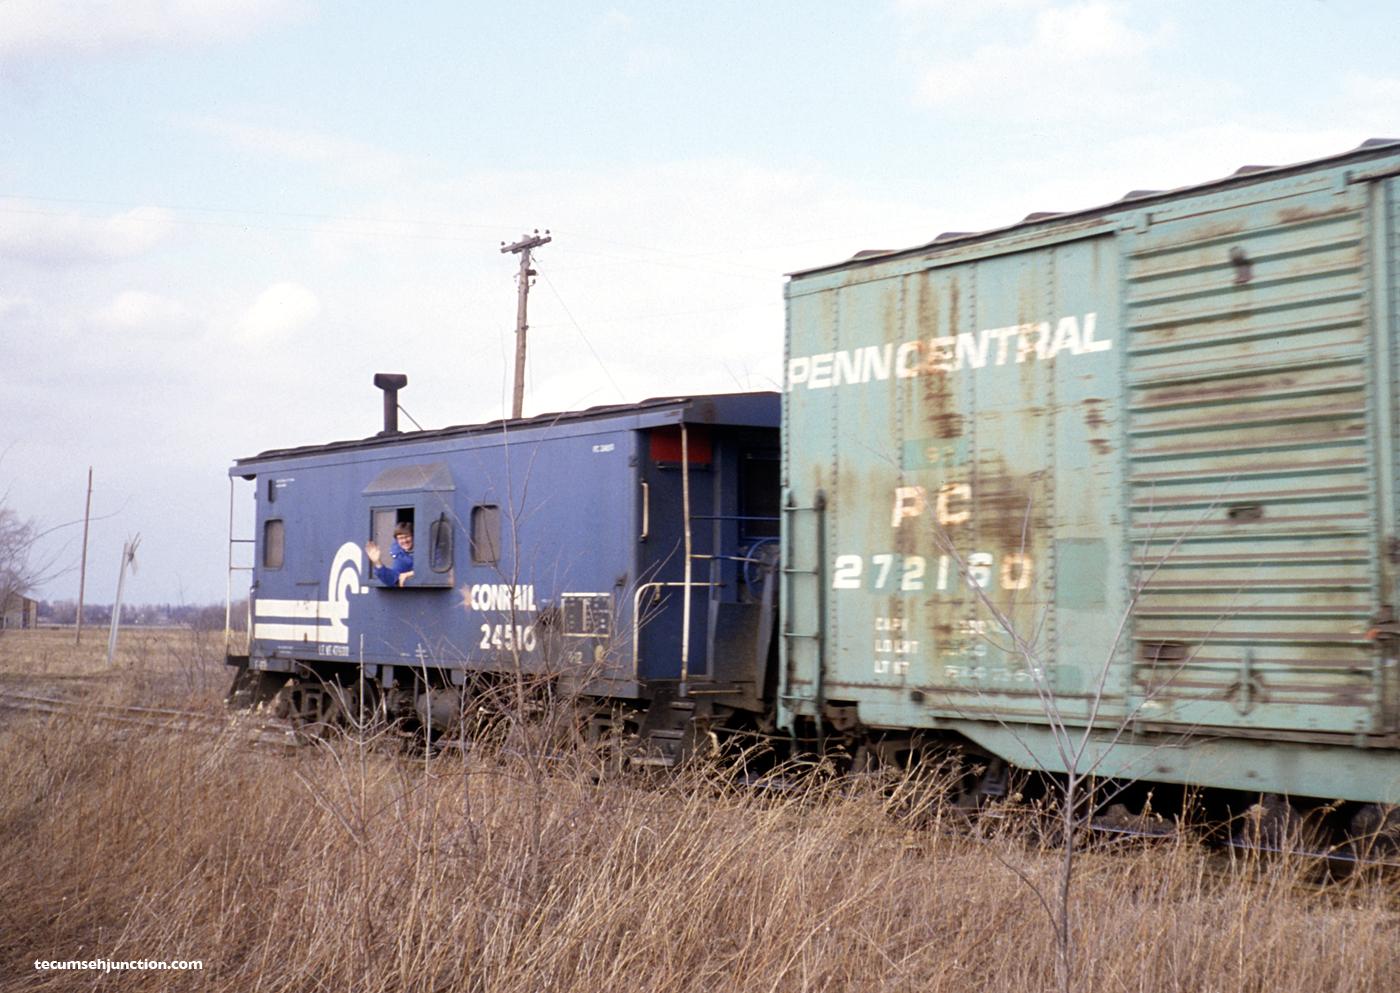 Conrail caboose #24510 at Palmyra, MI on 16 March 1981